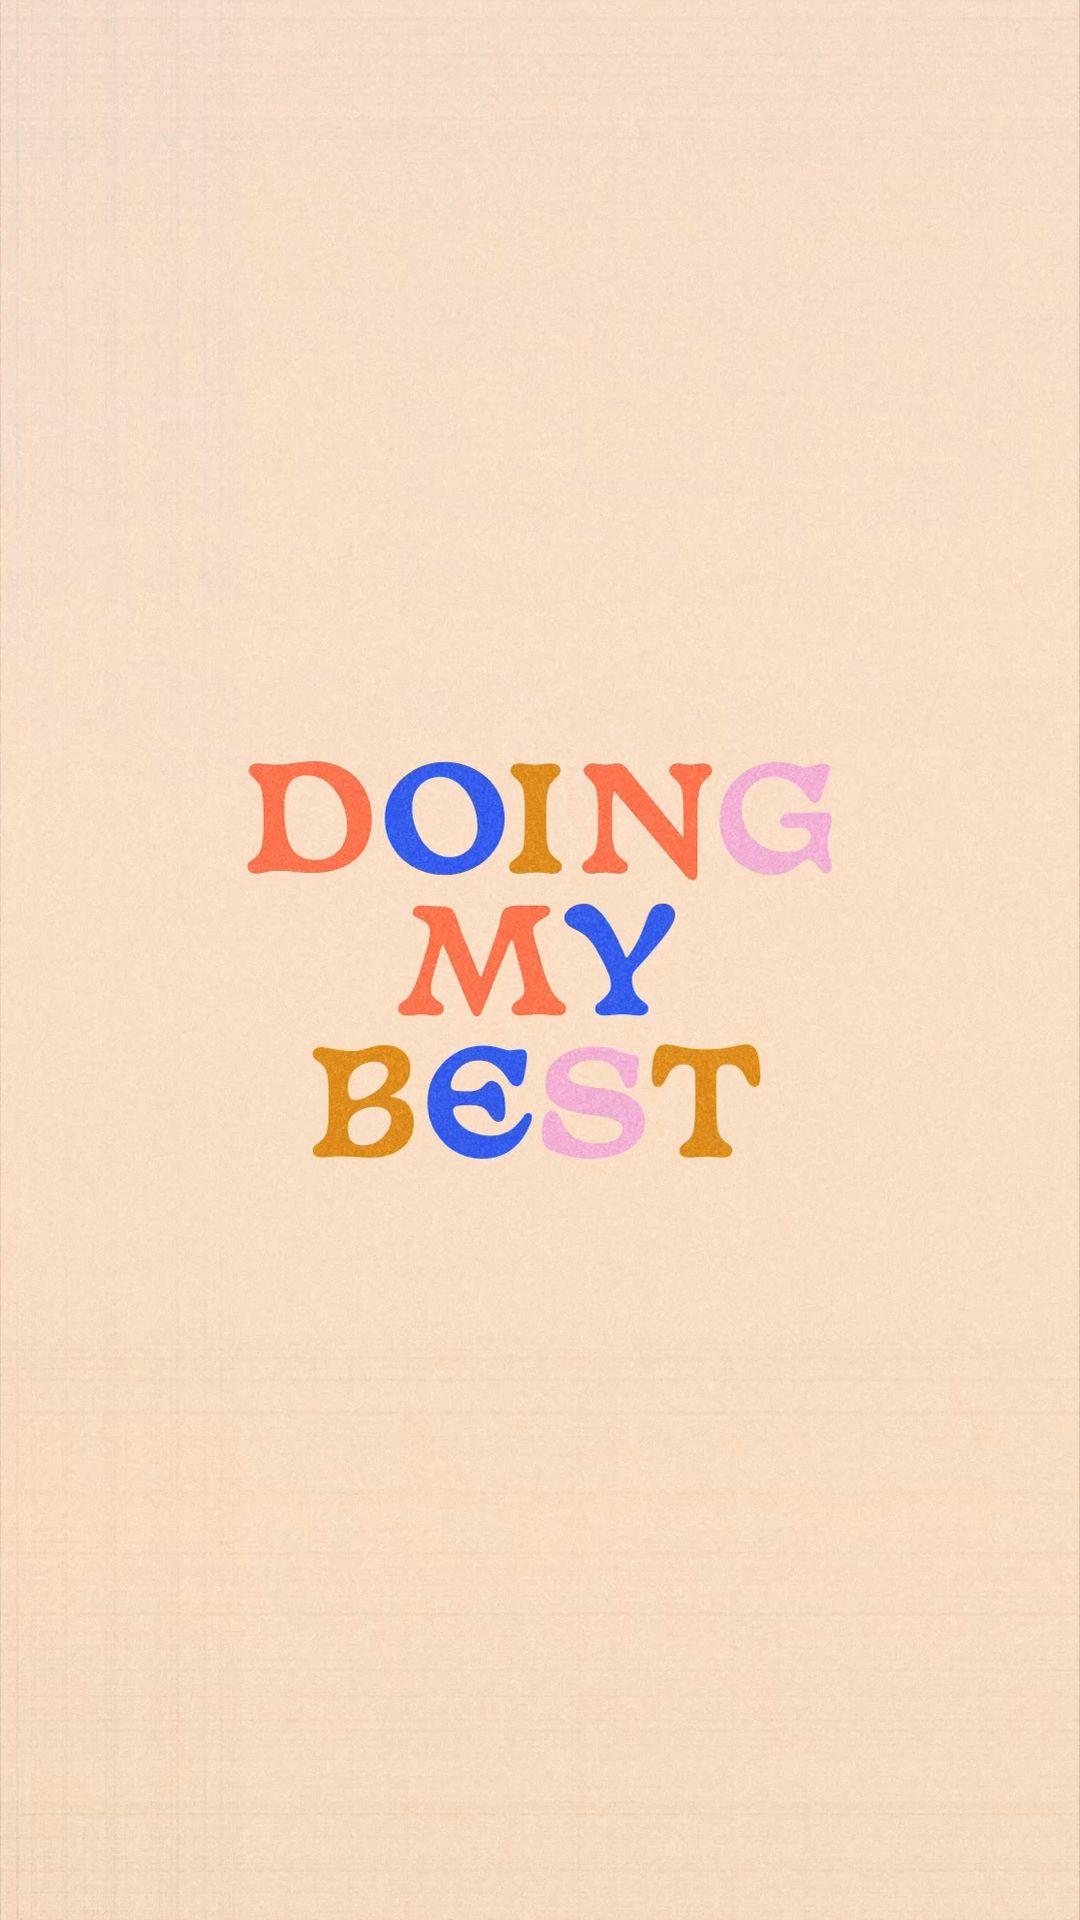 doing my best ✽